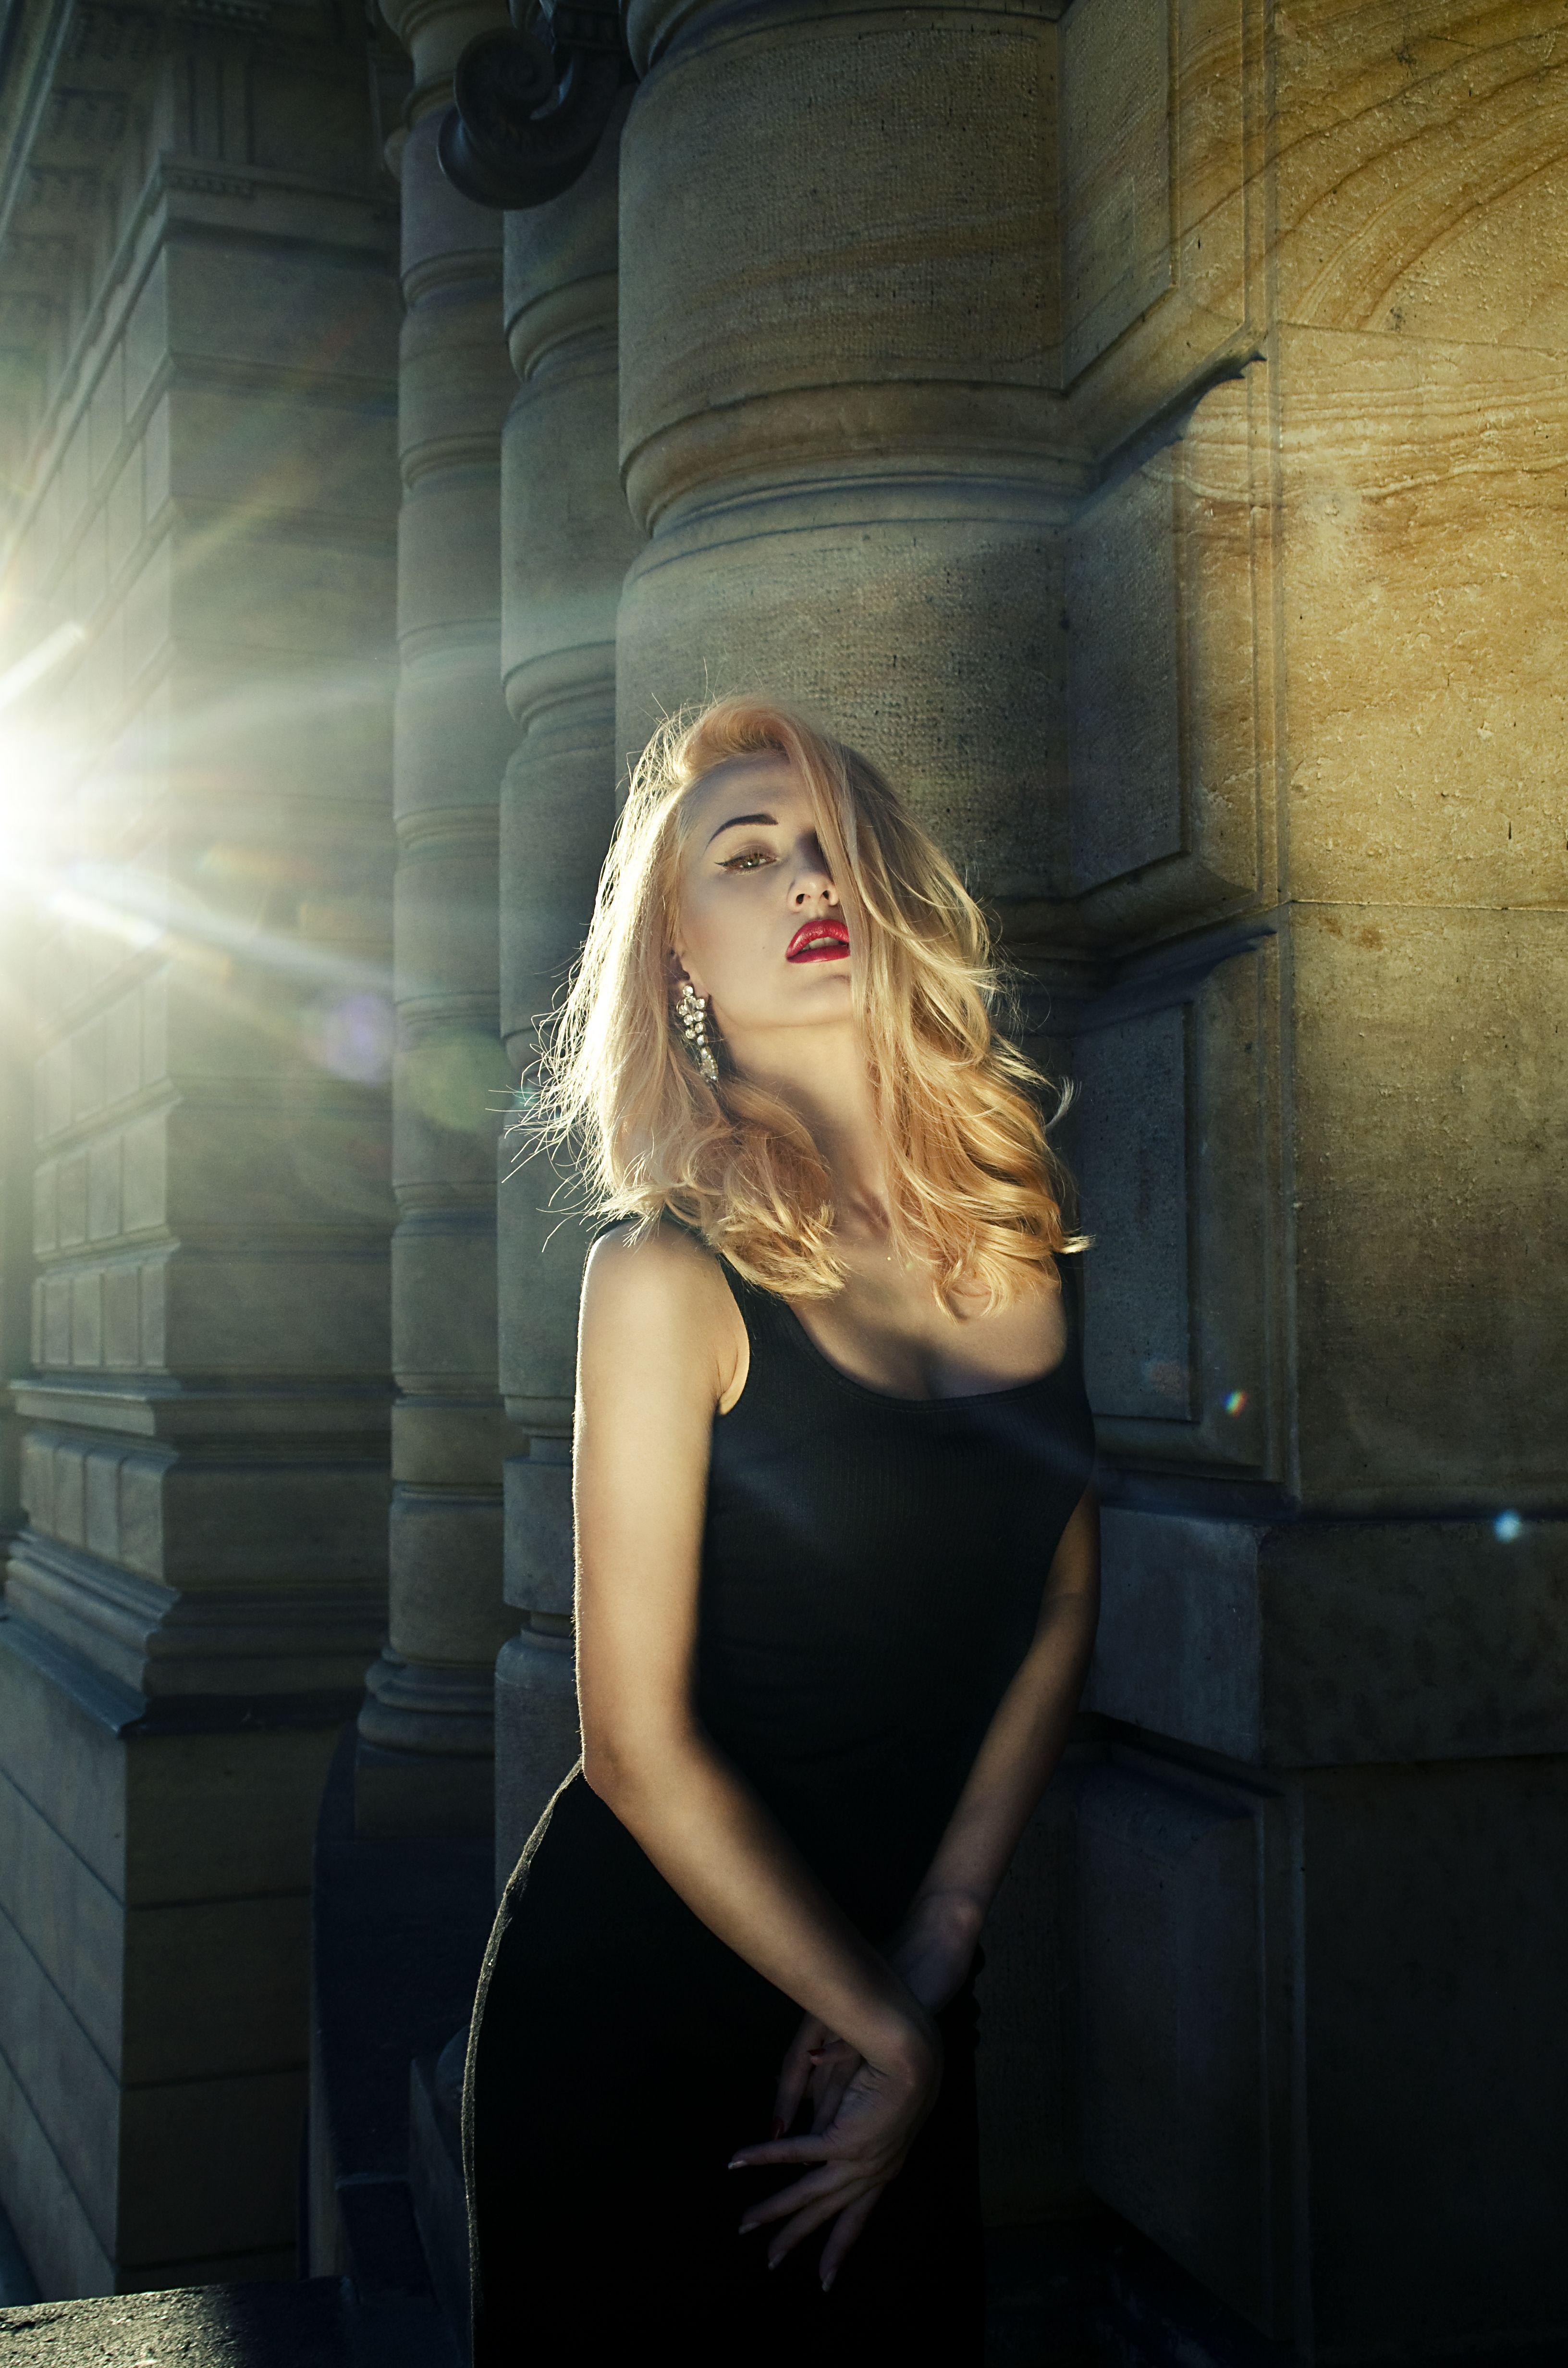 Spontaneous photo session with hot Anna Mimieux By Koki9